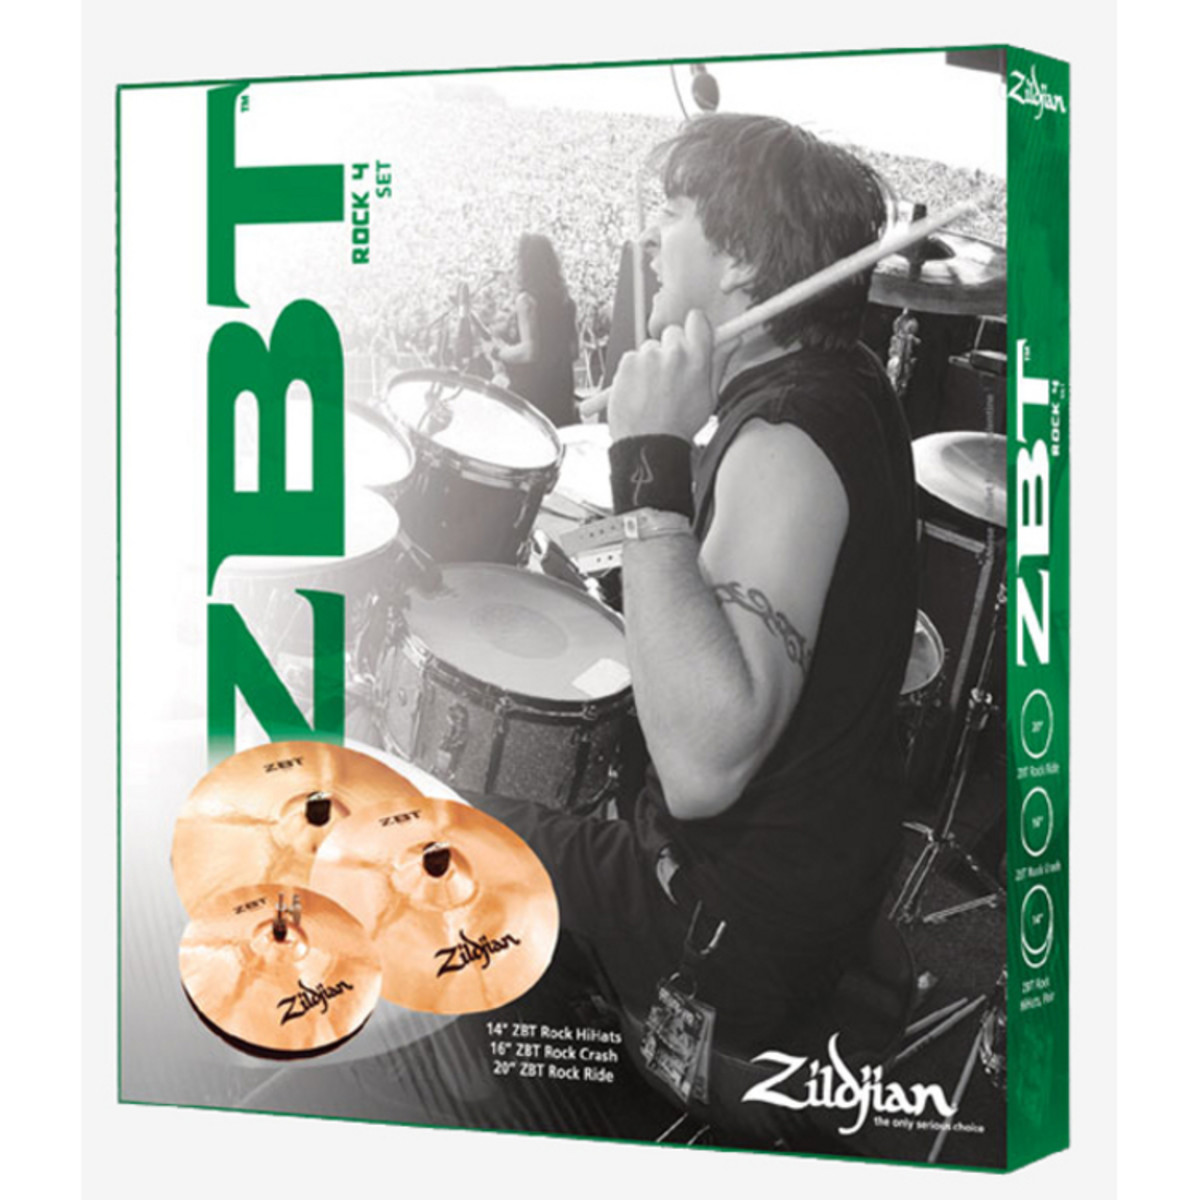 Zildjian ZBT R4P Rock 4 symbaalin paketti bonuksena 18